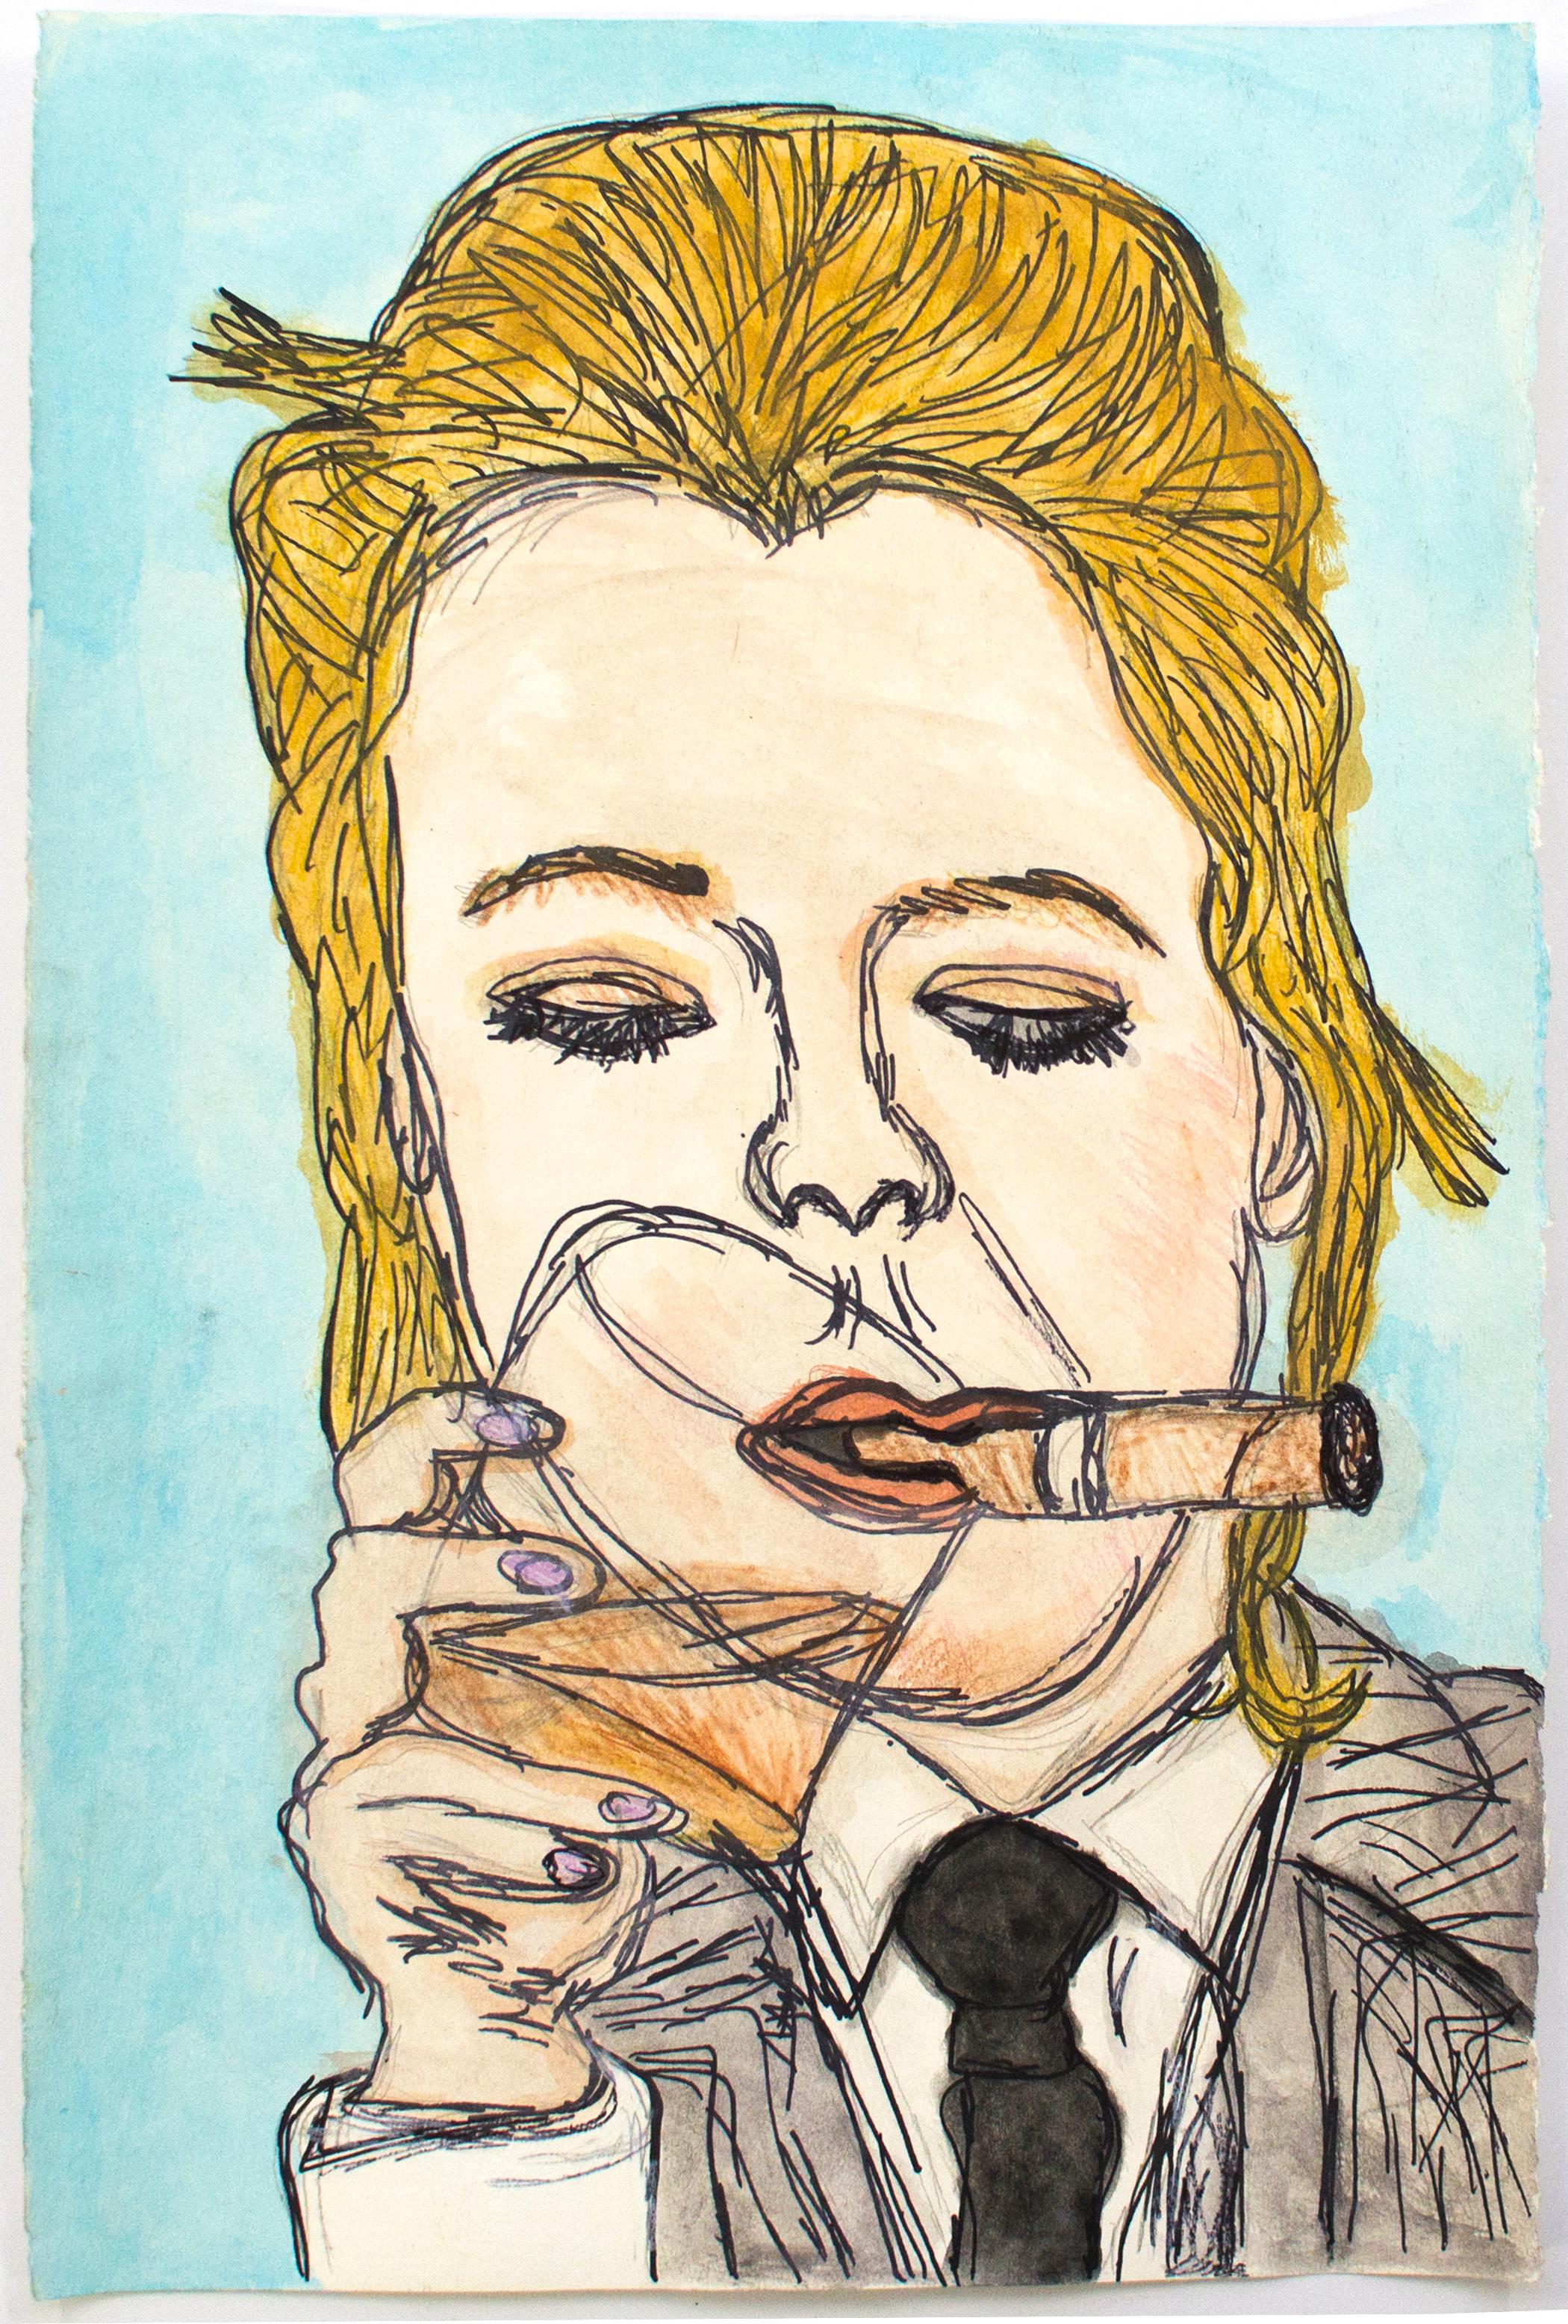 Kim Clark, Untitled (KC 98), 13.125 x 20 inches